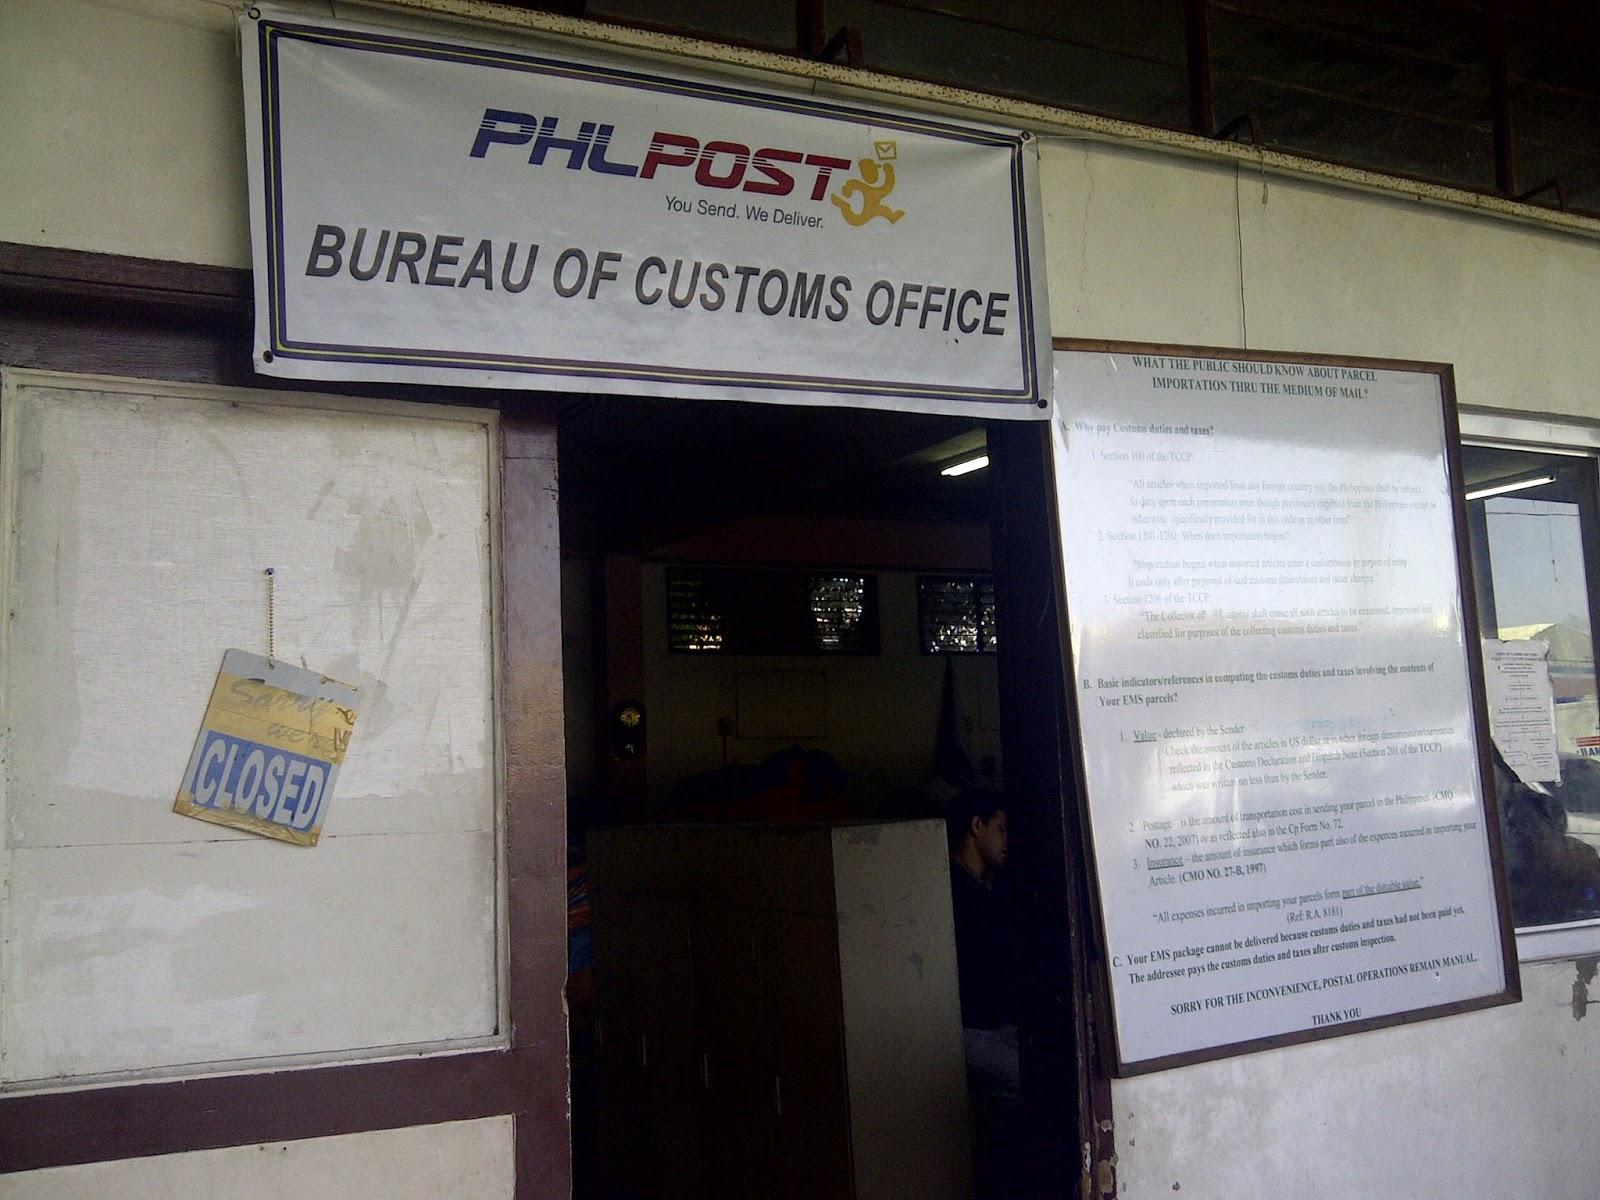 philpost bureau of customs service experience the bitch is back. Black Bedroom Furniture Sets. Home Design Ideas